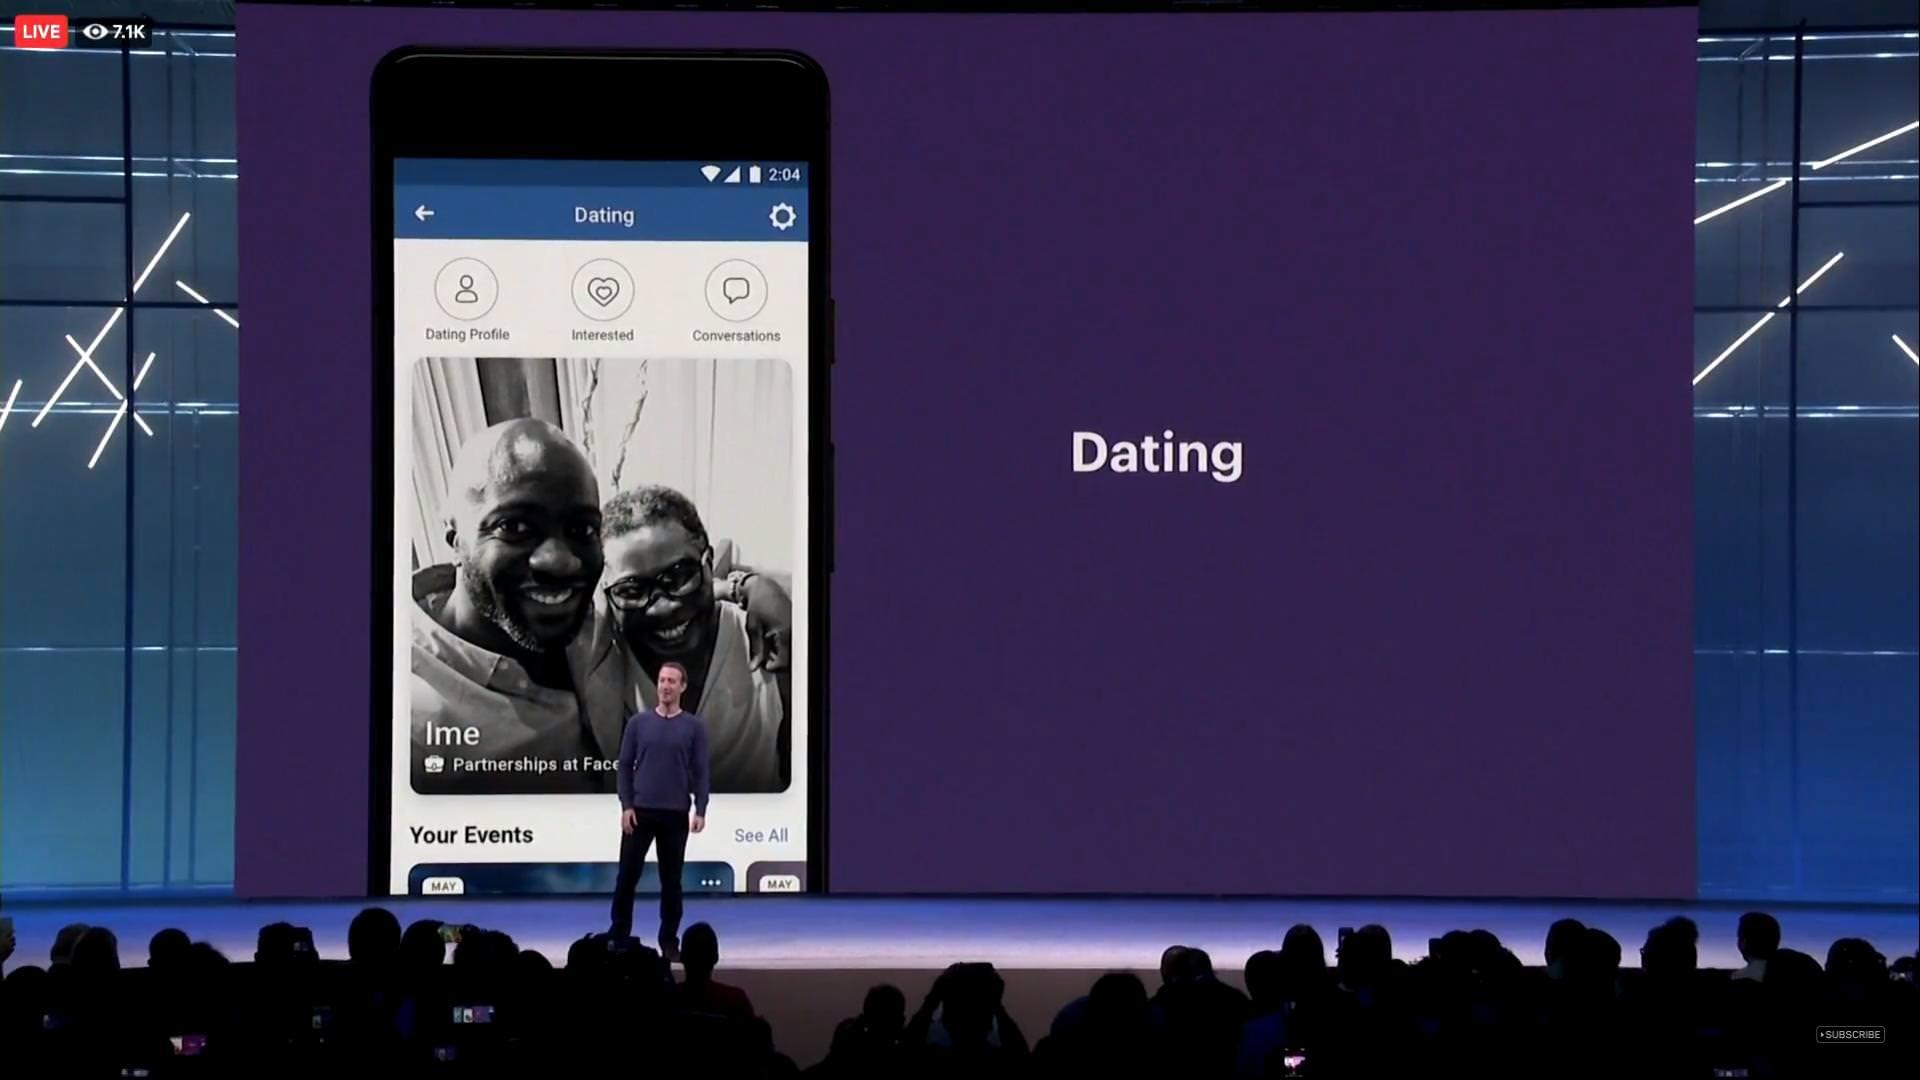 KZN Dating Club